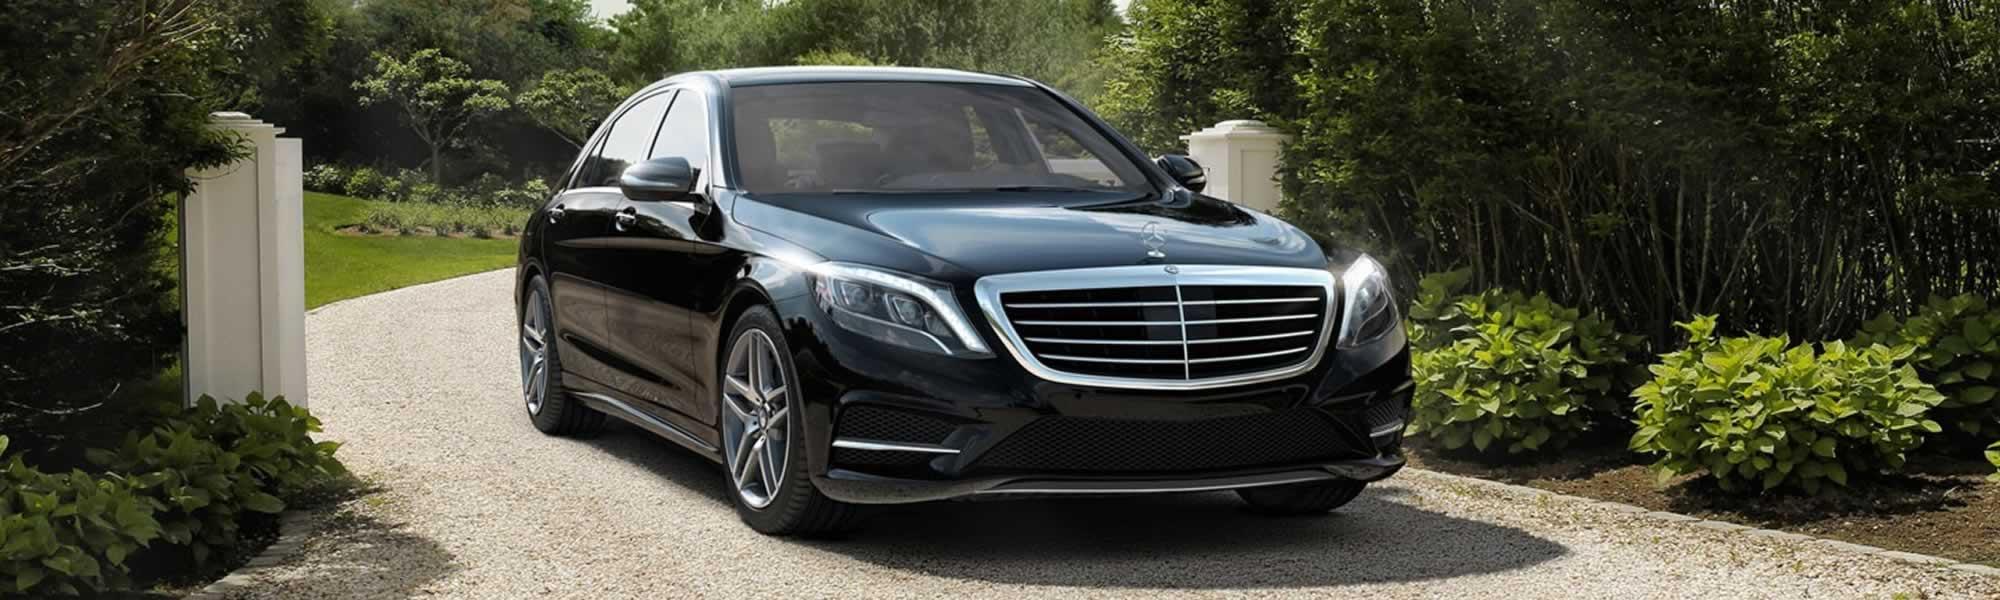 Executive Car Hire Fleet Herts Limos